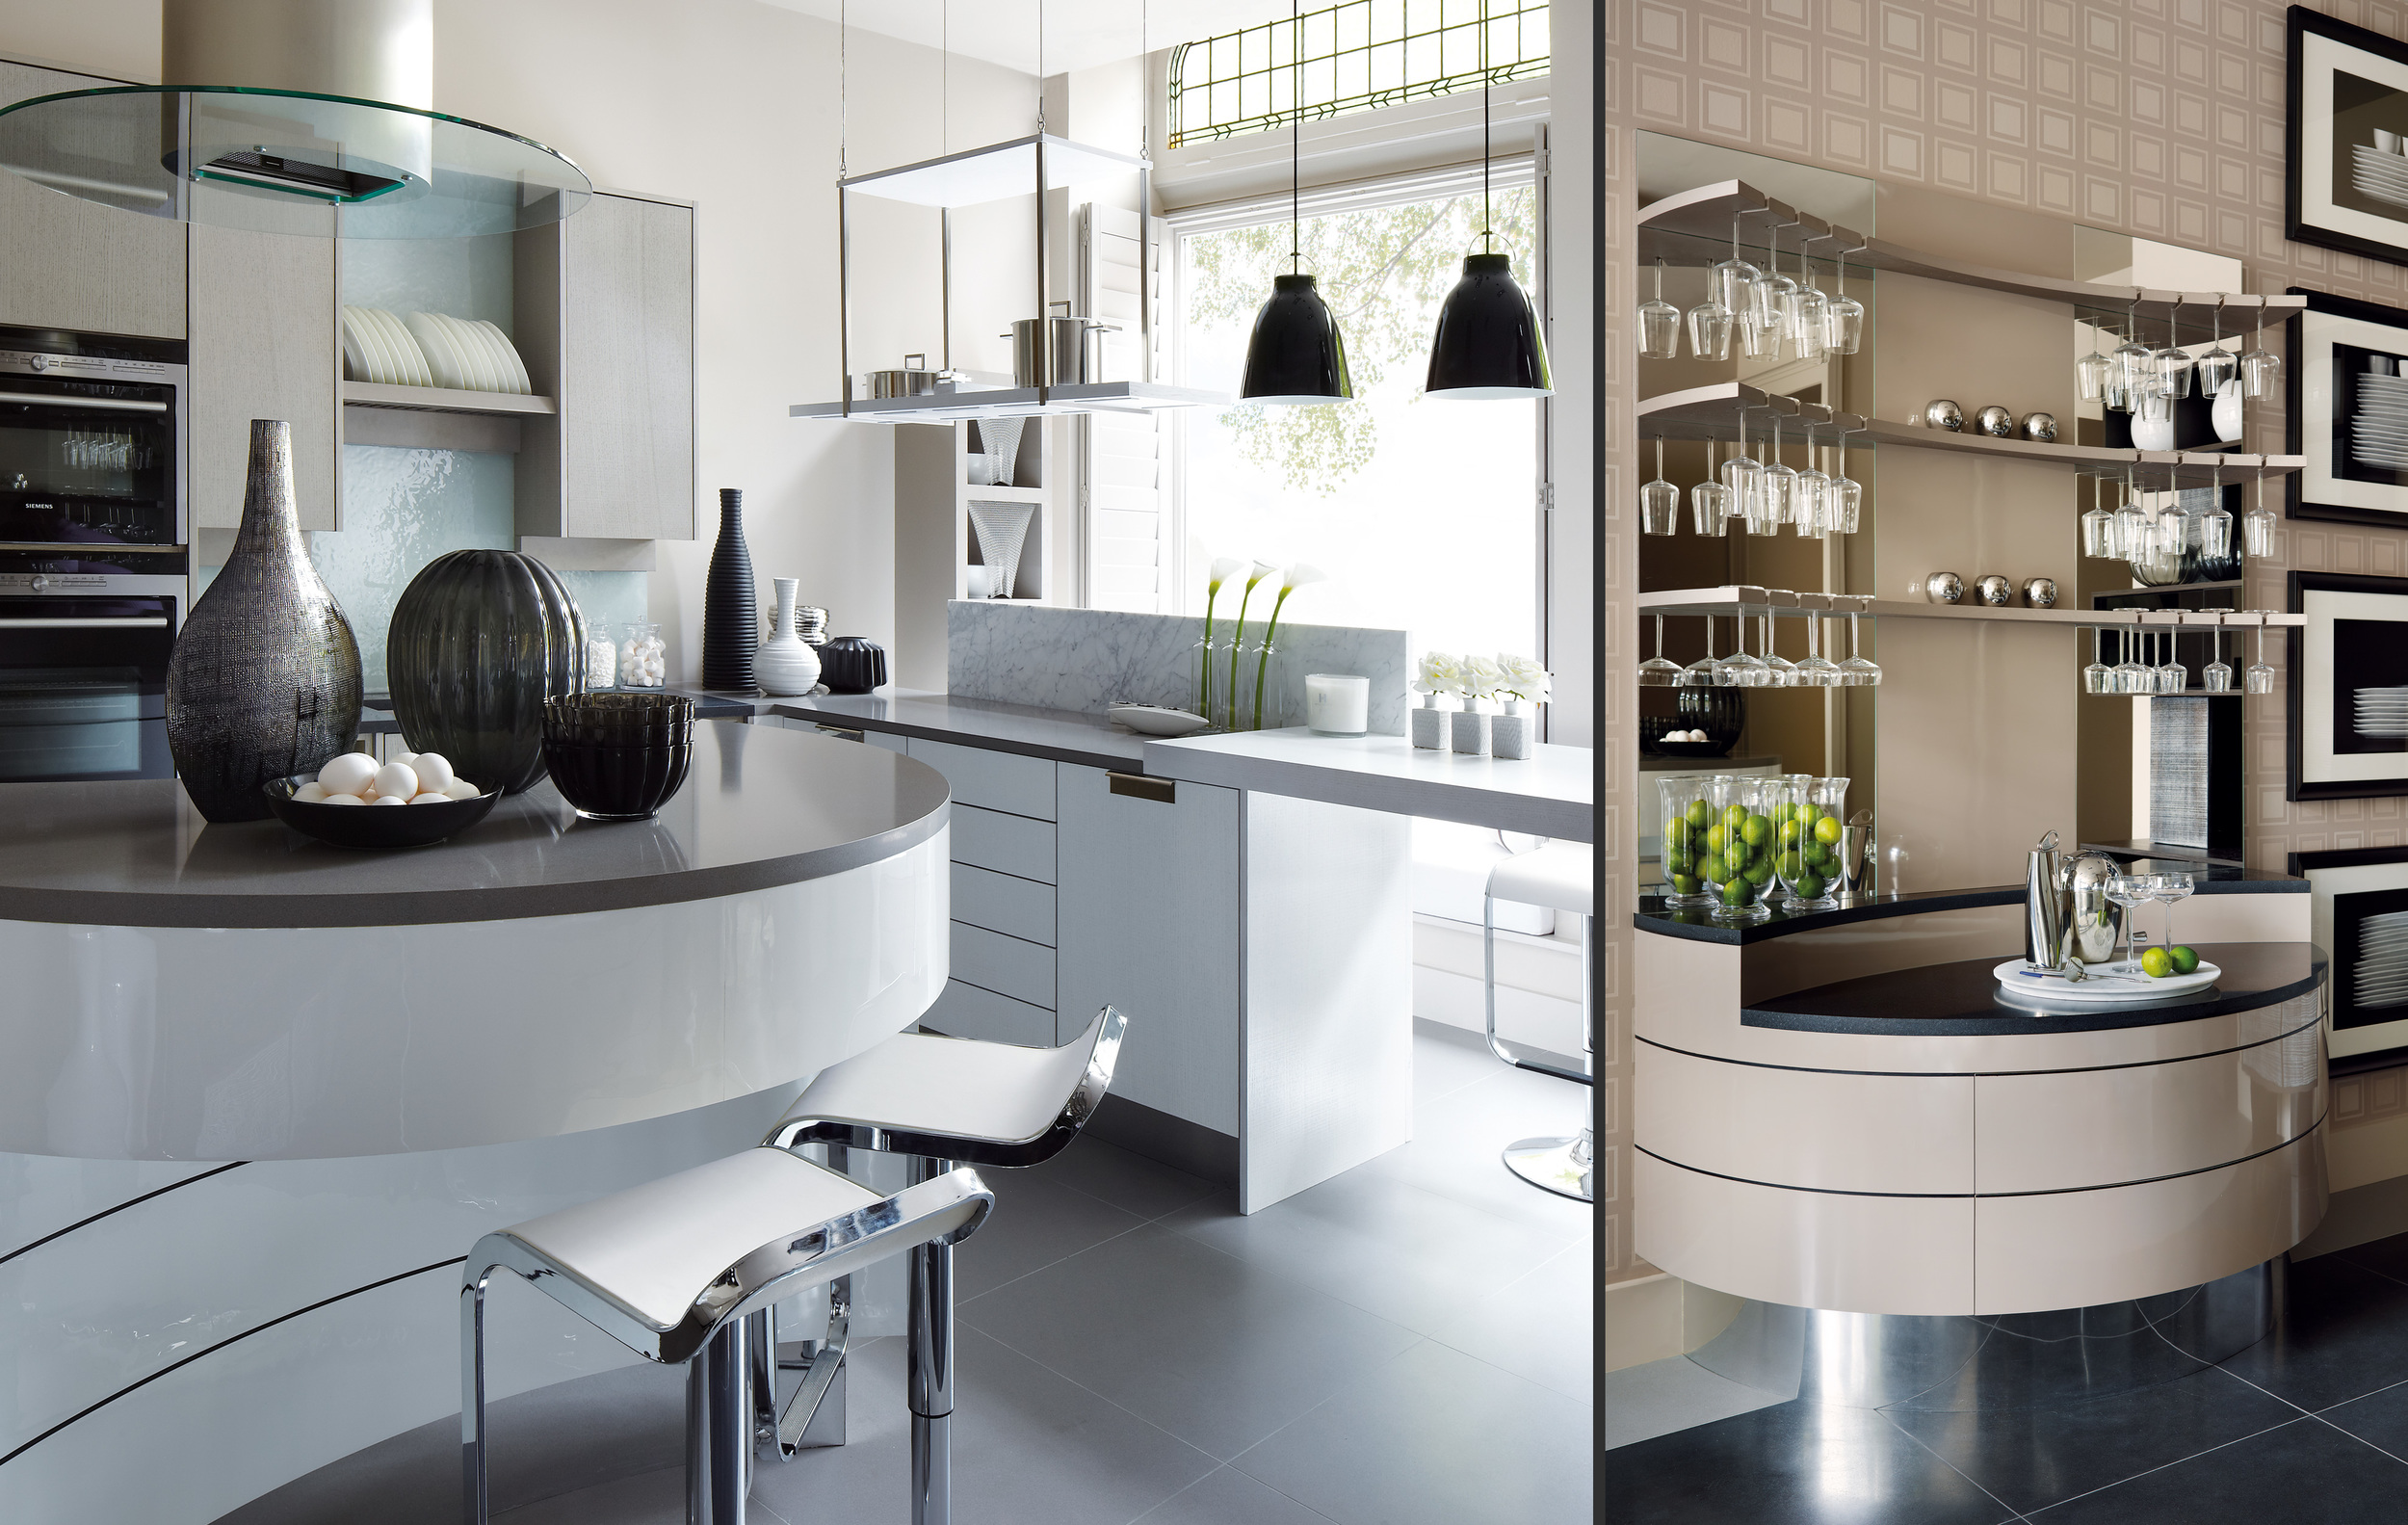 2-2-2-kelly-hoppen-4-kitchen-z.jpg